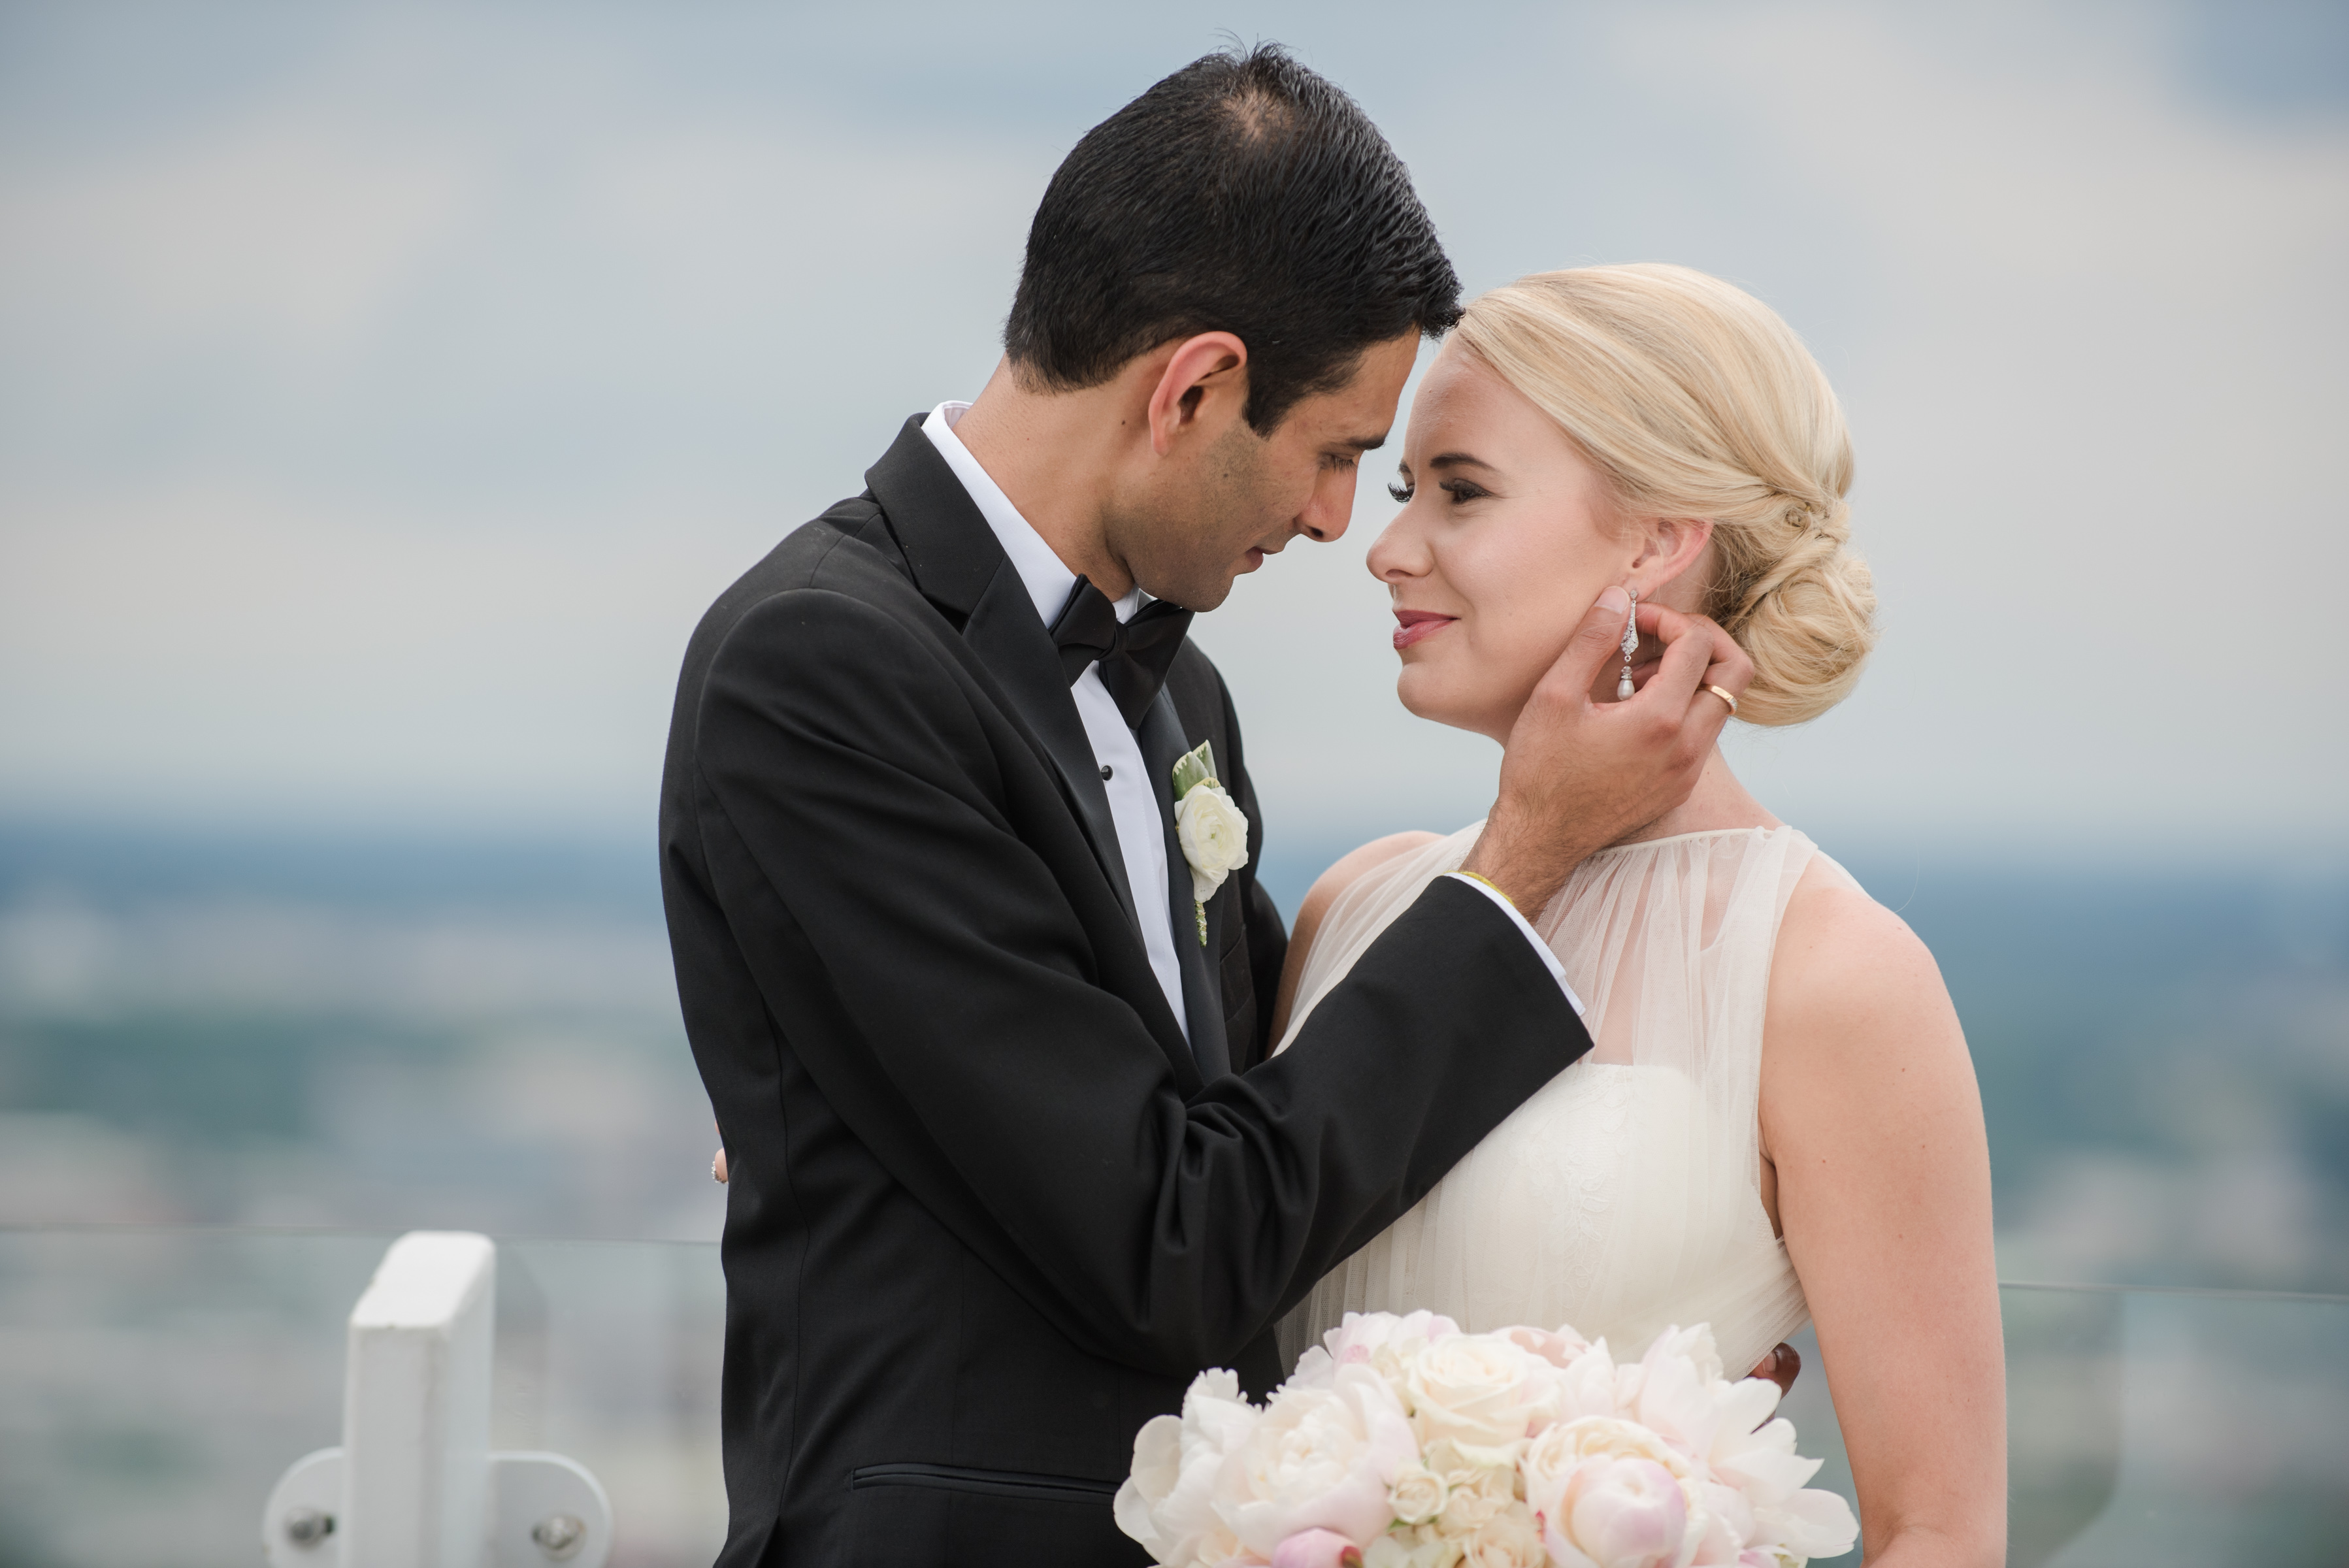 ak brides | wedding planner birmingham al